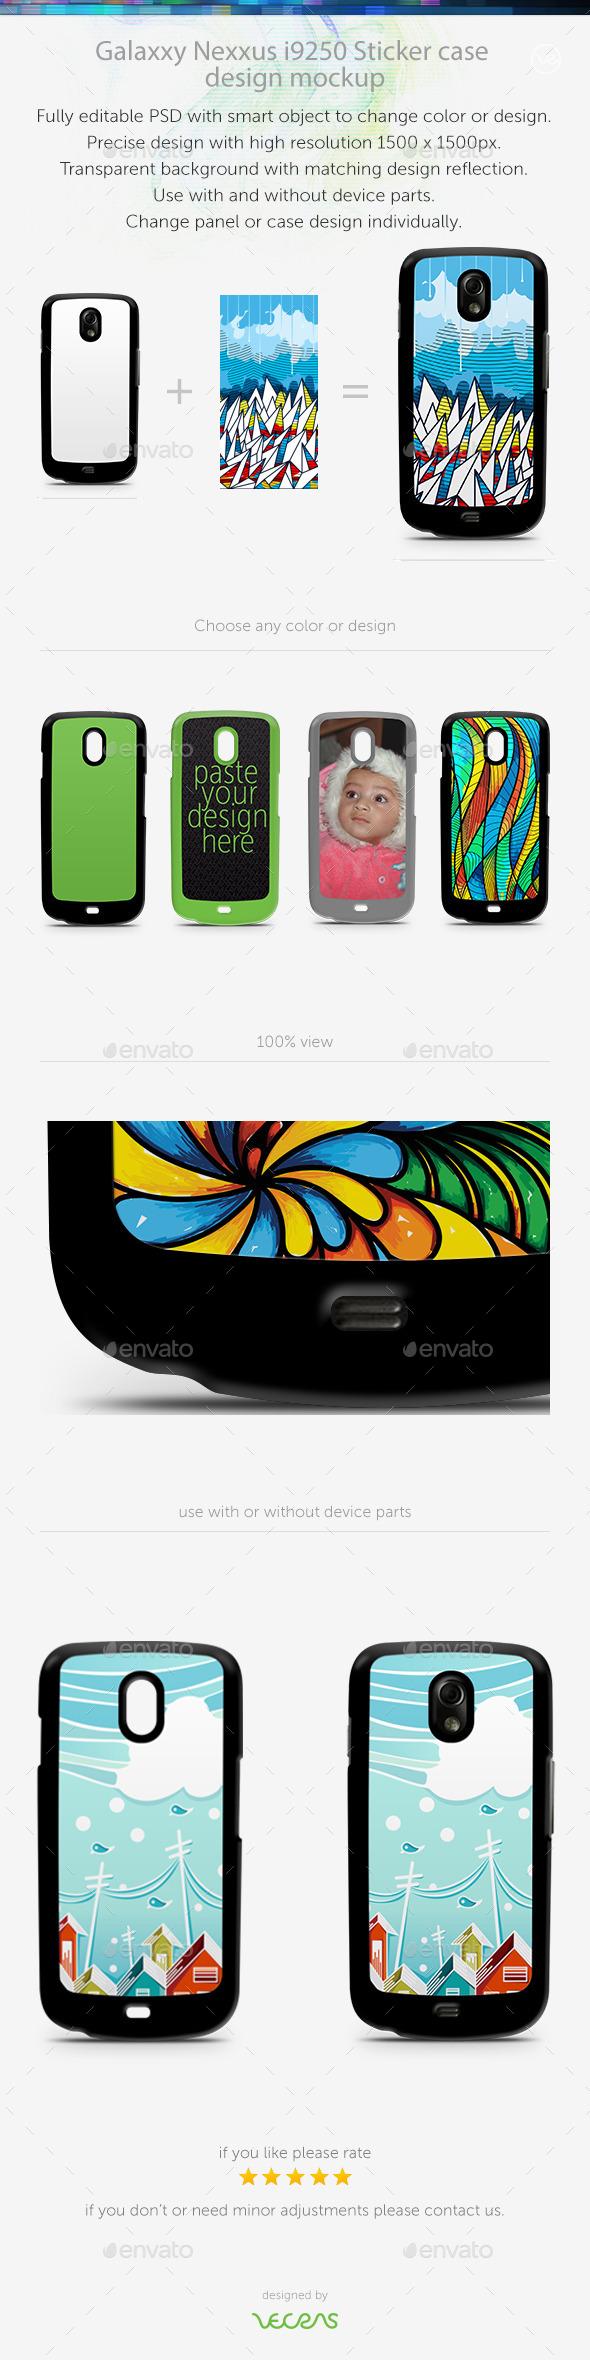 Galaxxy Nexus i9250 Sticker Case Design Mockup - Mobile Displays